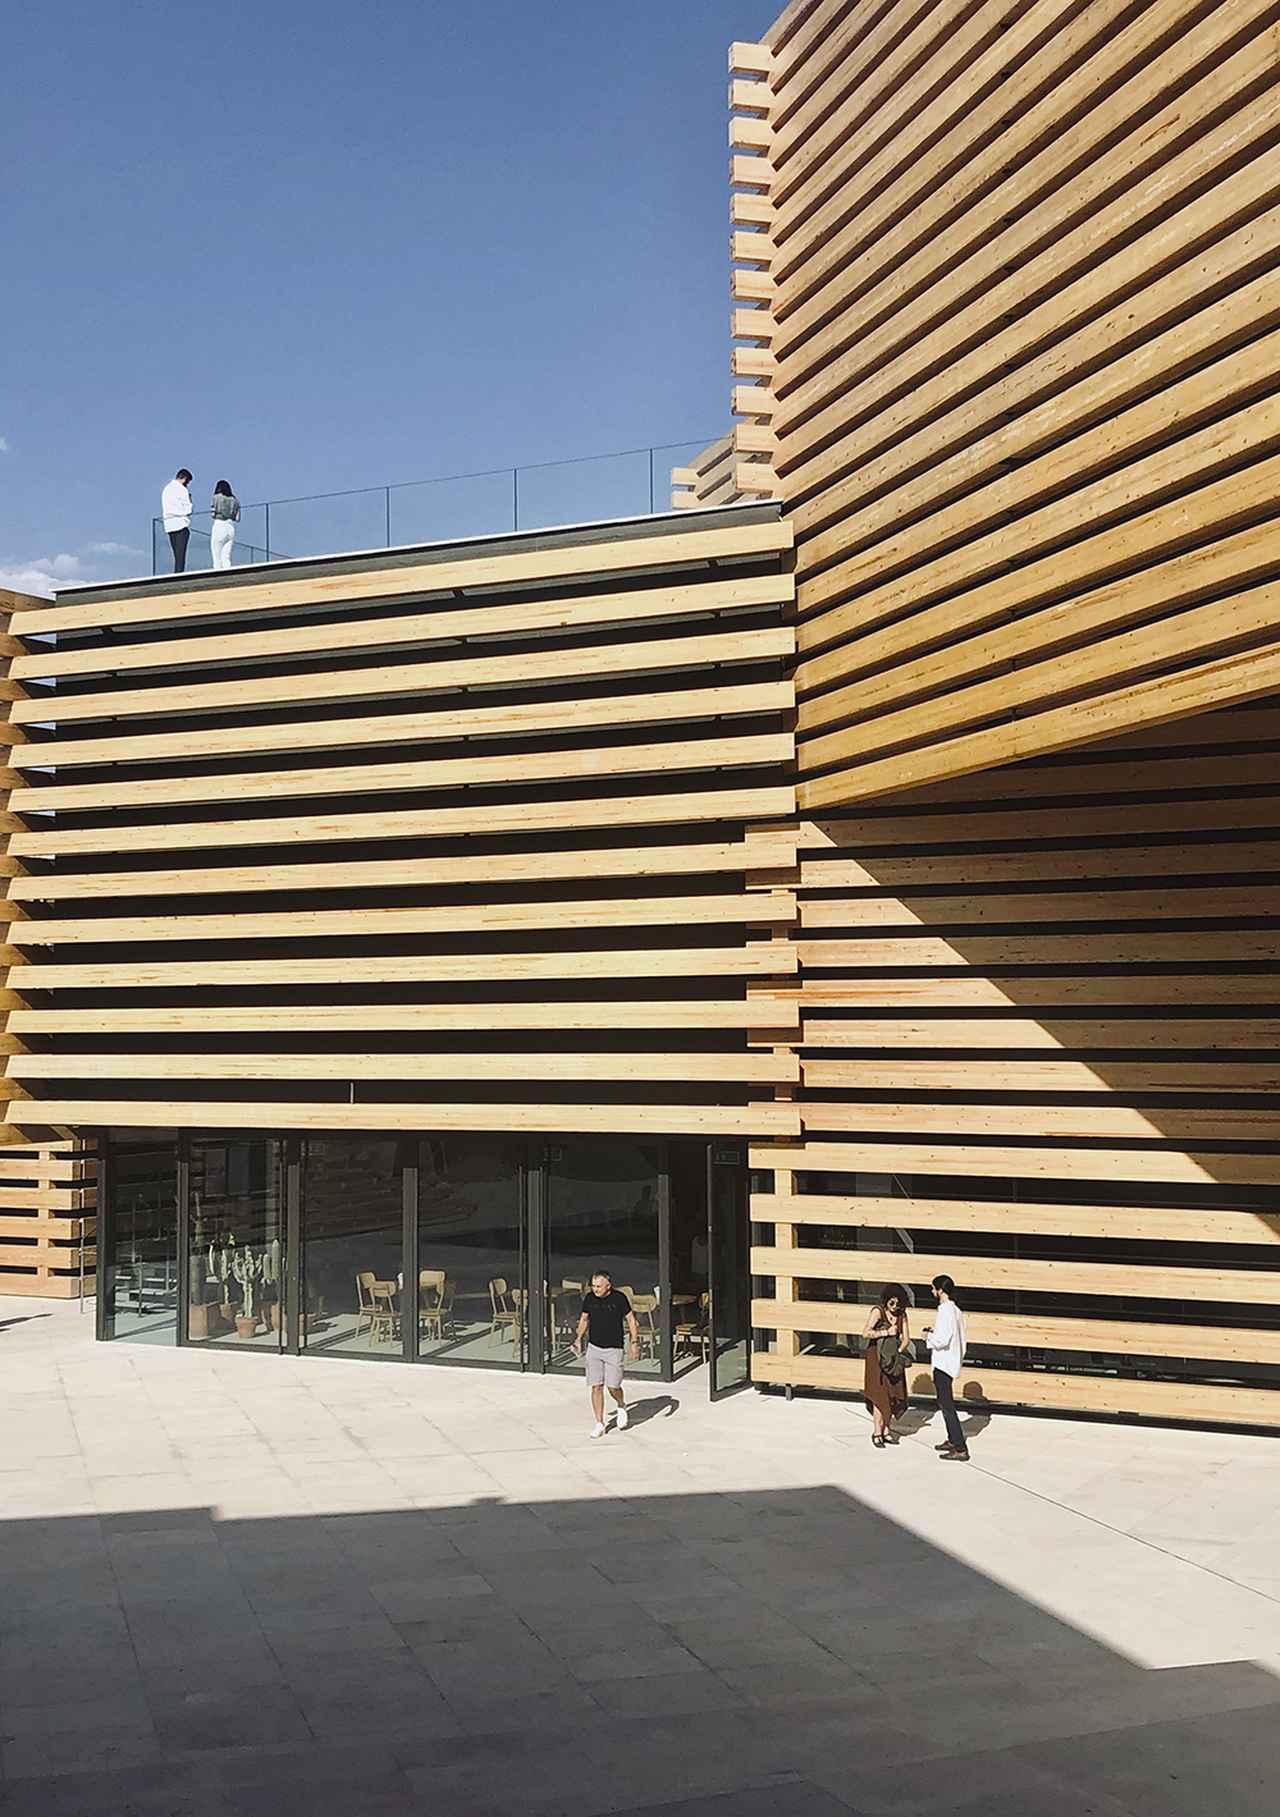 Images : 『隈研吾展 新しい公共性をつくるためのネコの5原則』 東京国立近代美術館